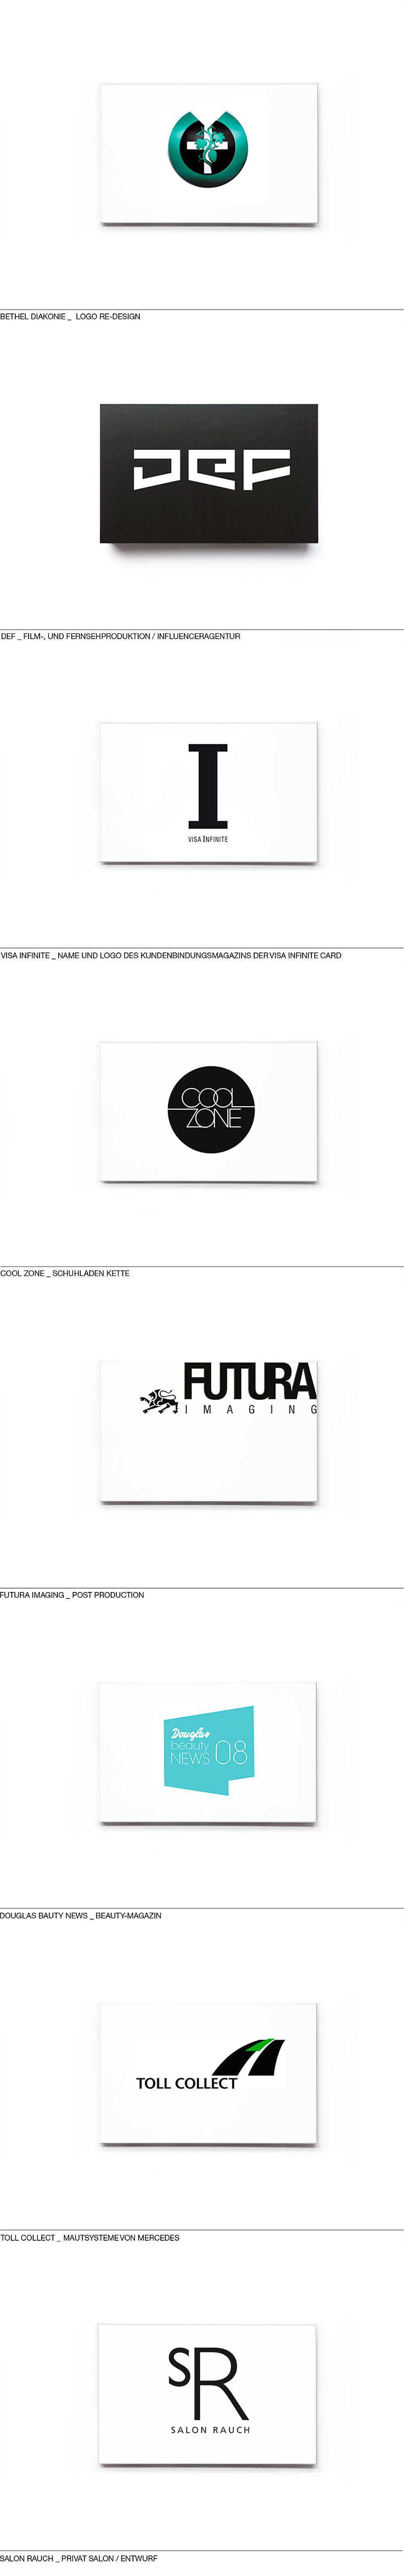 COEN Concept & Design Berlin - Logo Designs